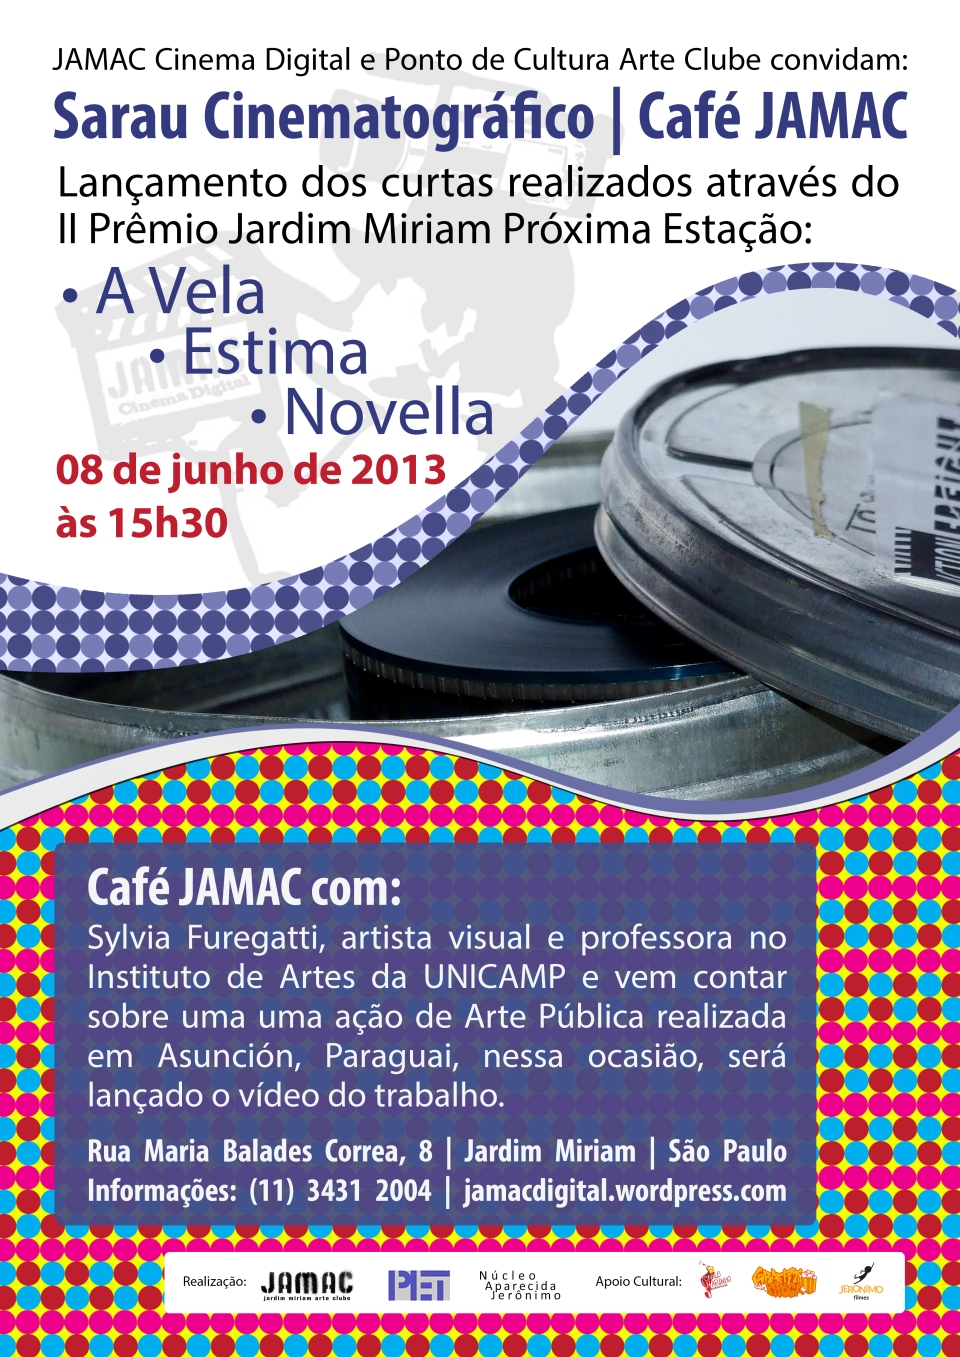 Sarau Cinematográfico + Café JAMAC